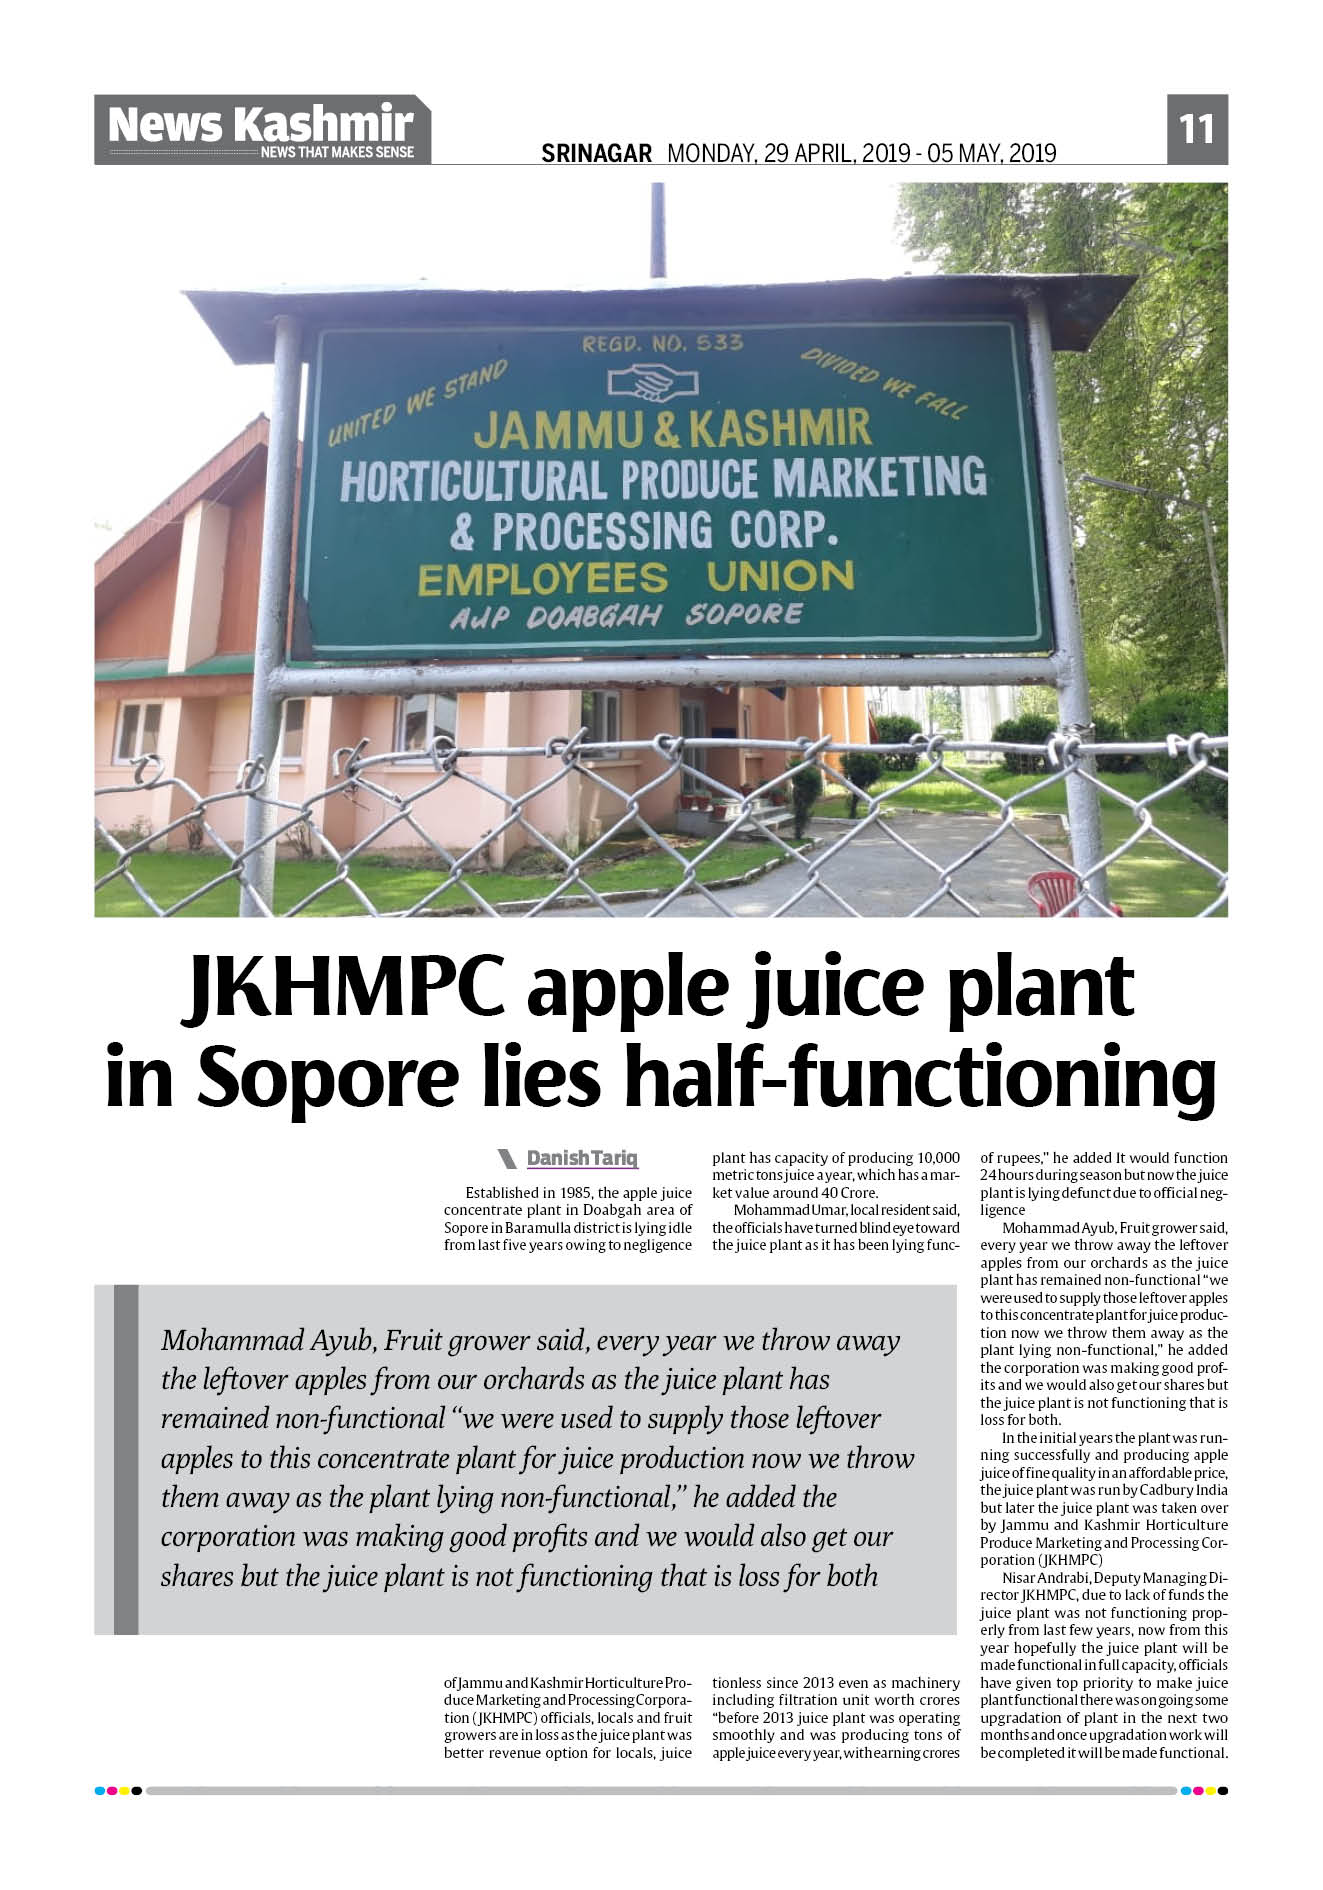 JKHMPC apple juice plant in Sopore lies half-functioning